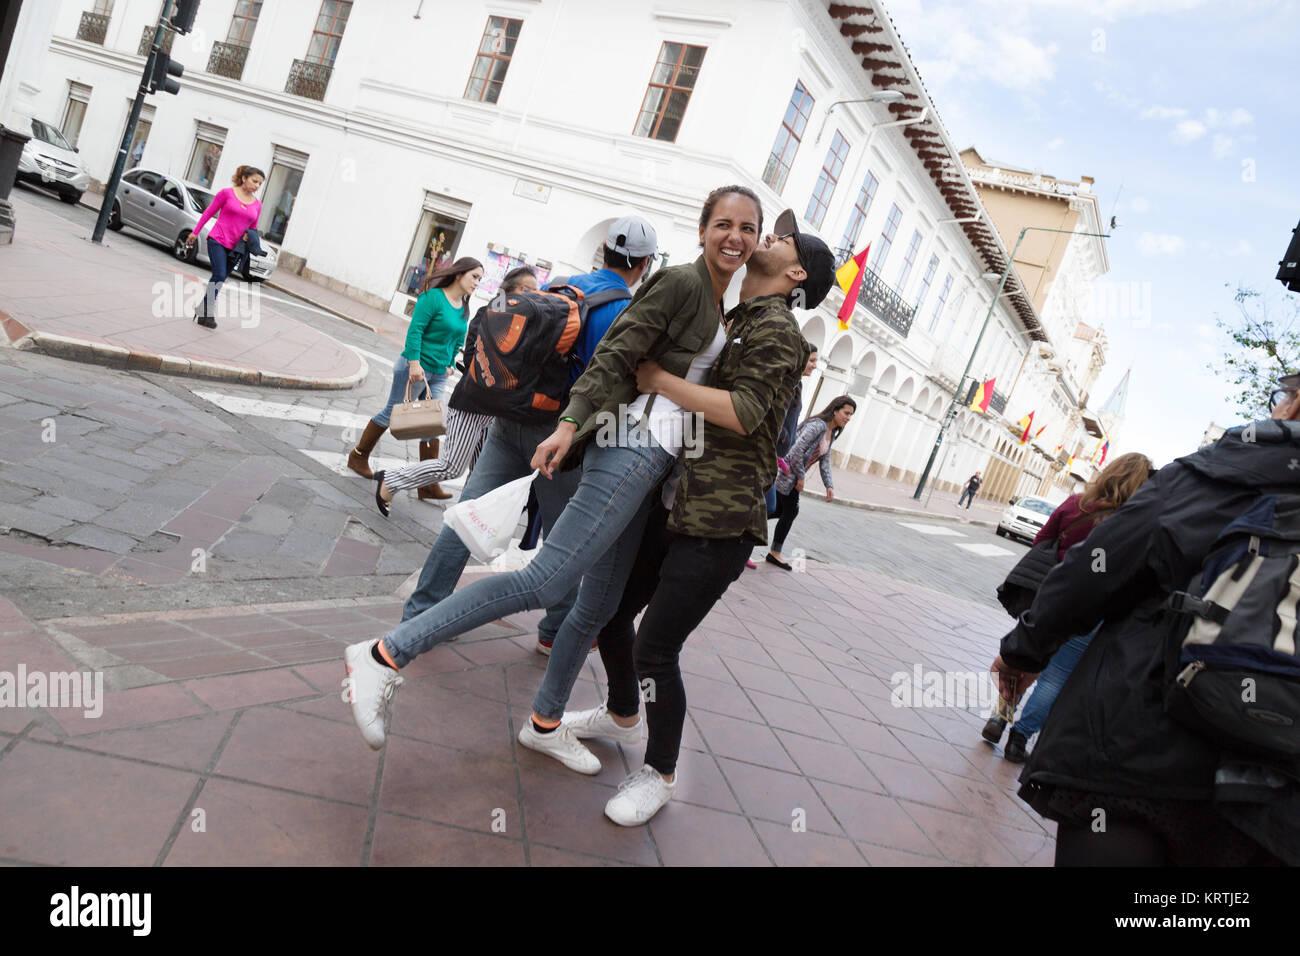 street-photography-ecuador-south-america-a-happy-couple-hugging-in-KRTJE2.jpg